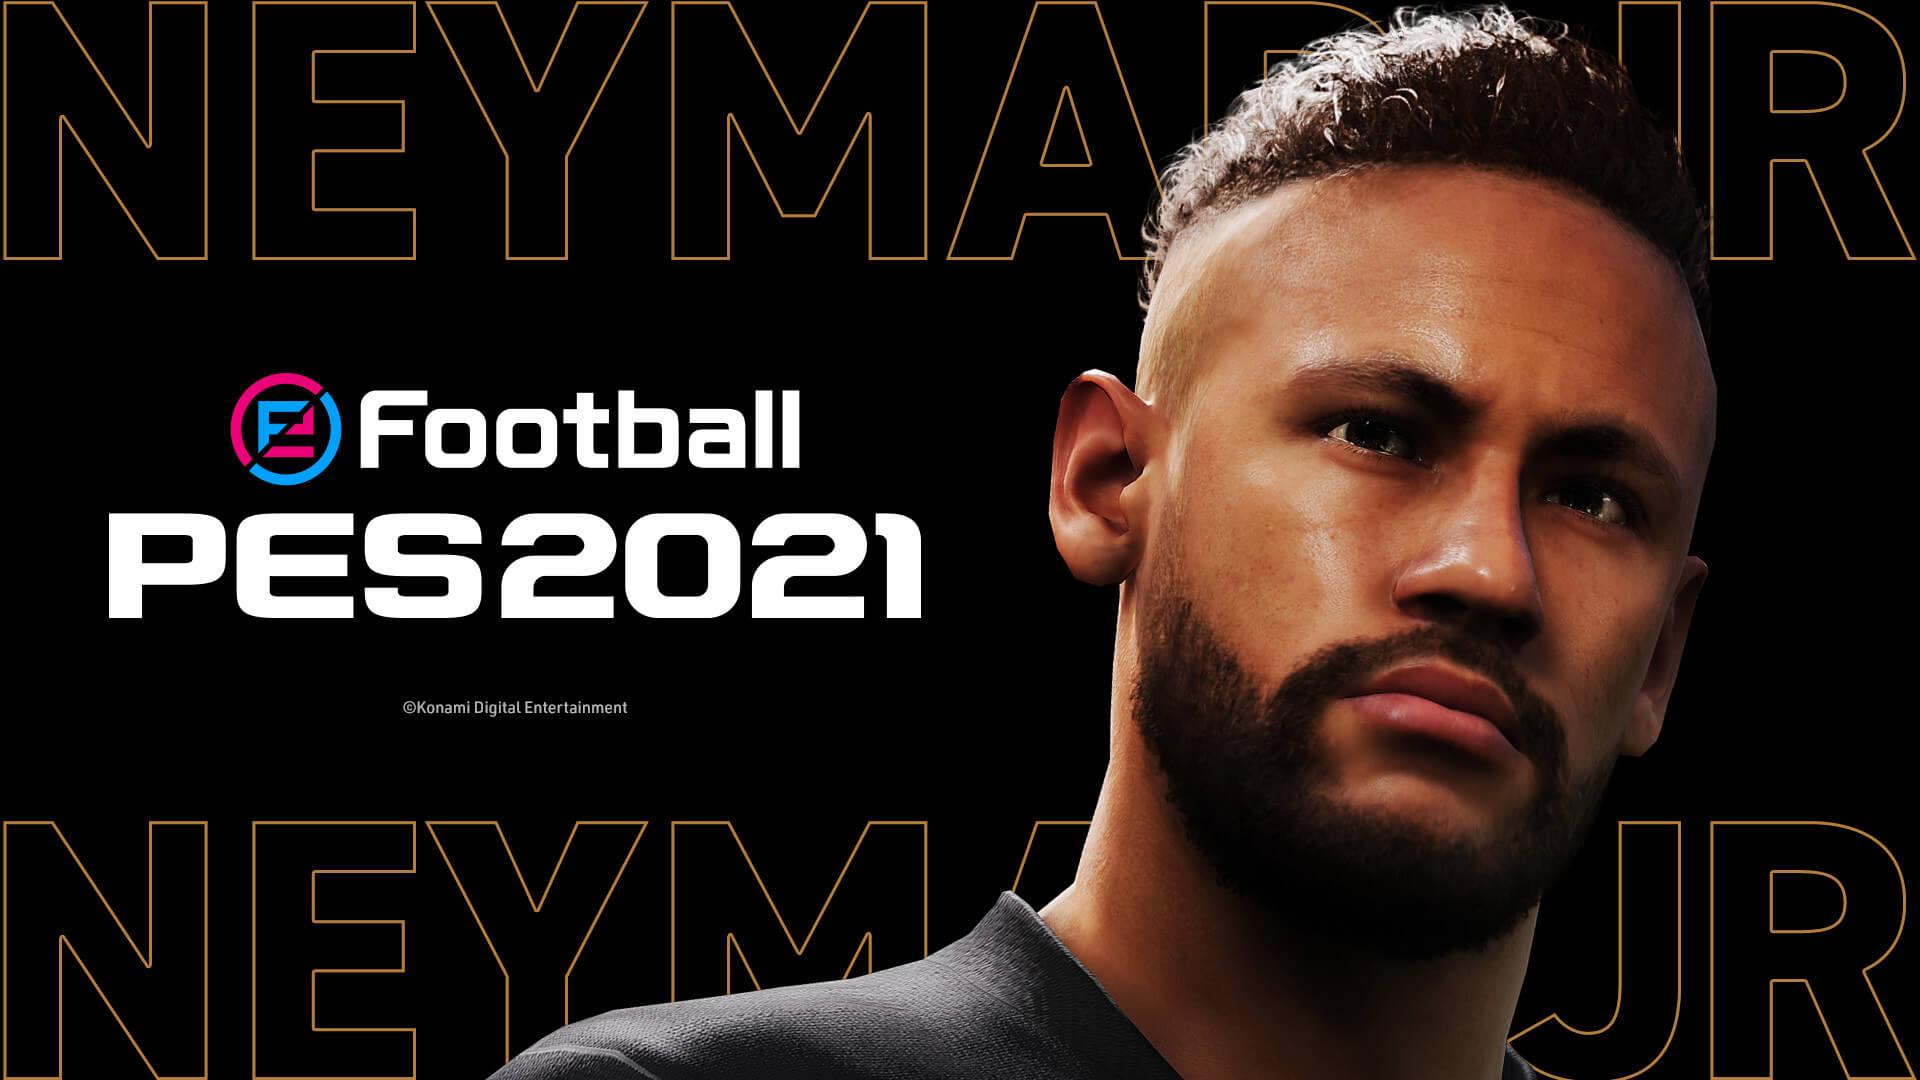 neymar pes2021 01 b